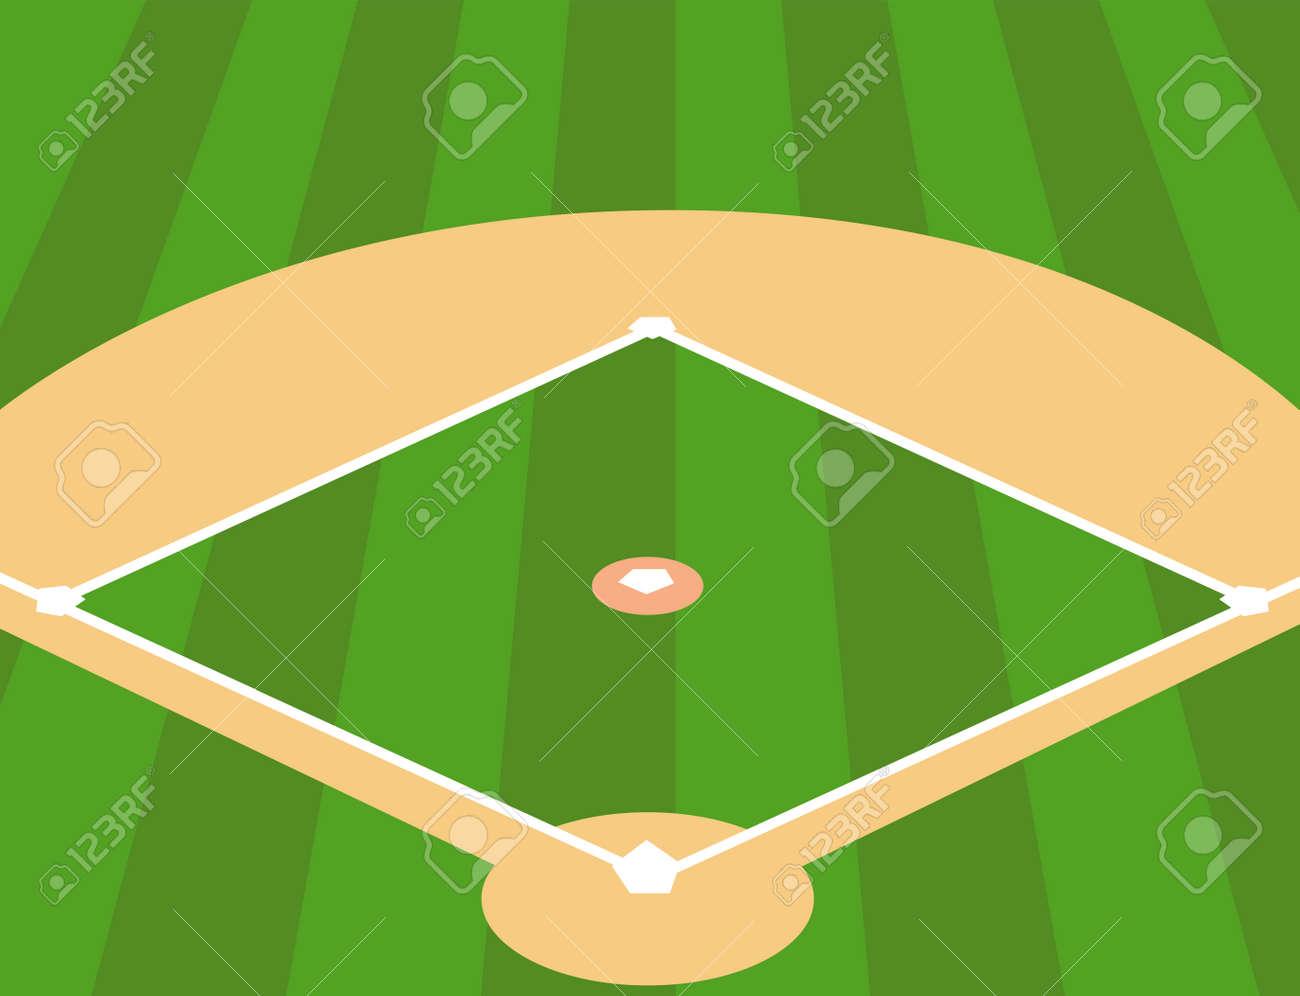 Vector Illustration of Baseball Field as Background - 60249812